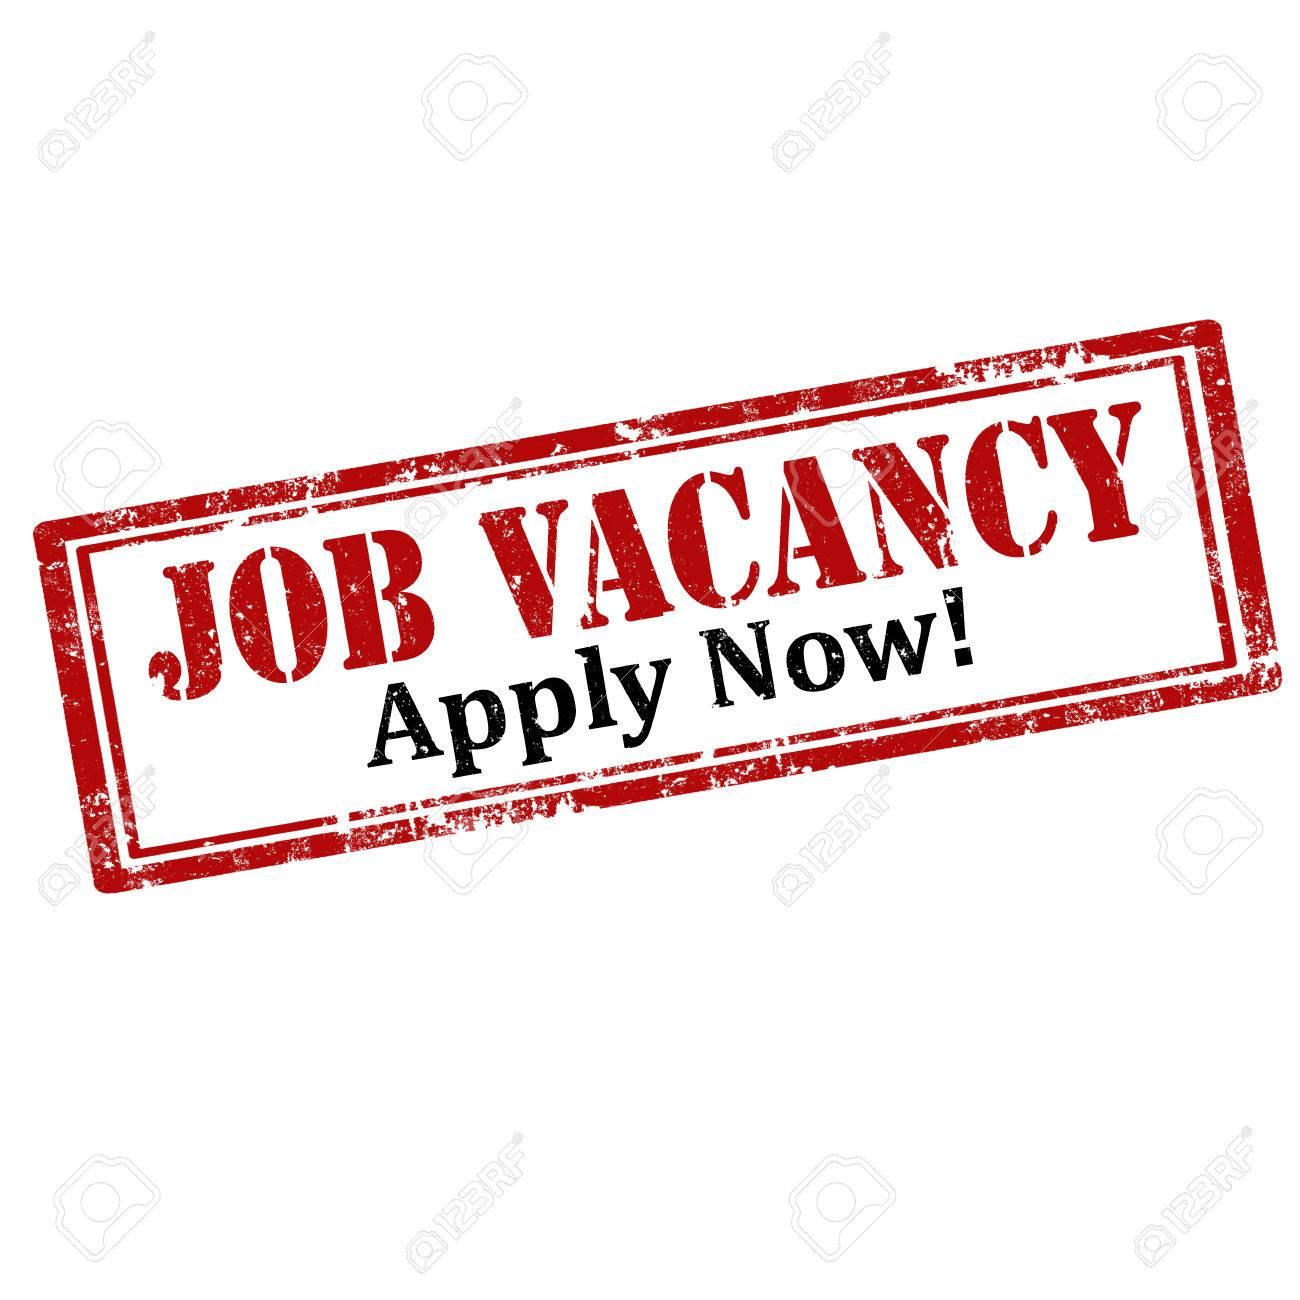 Sales and Marketing Jobs 2021| Jobs at HR World limited, marketing jobsin tanzania, sales job tanzania, marketing jobs in dar es salaam